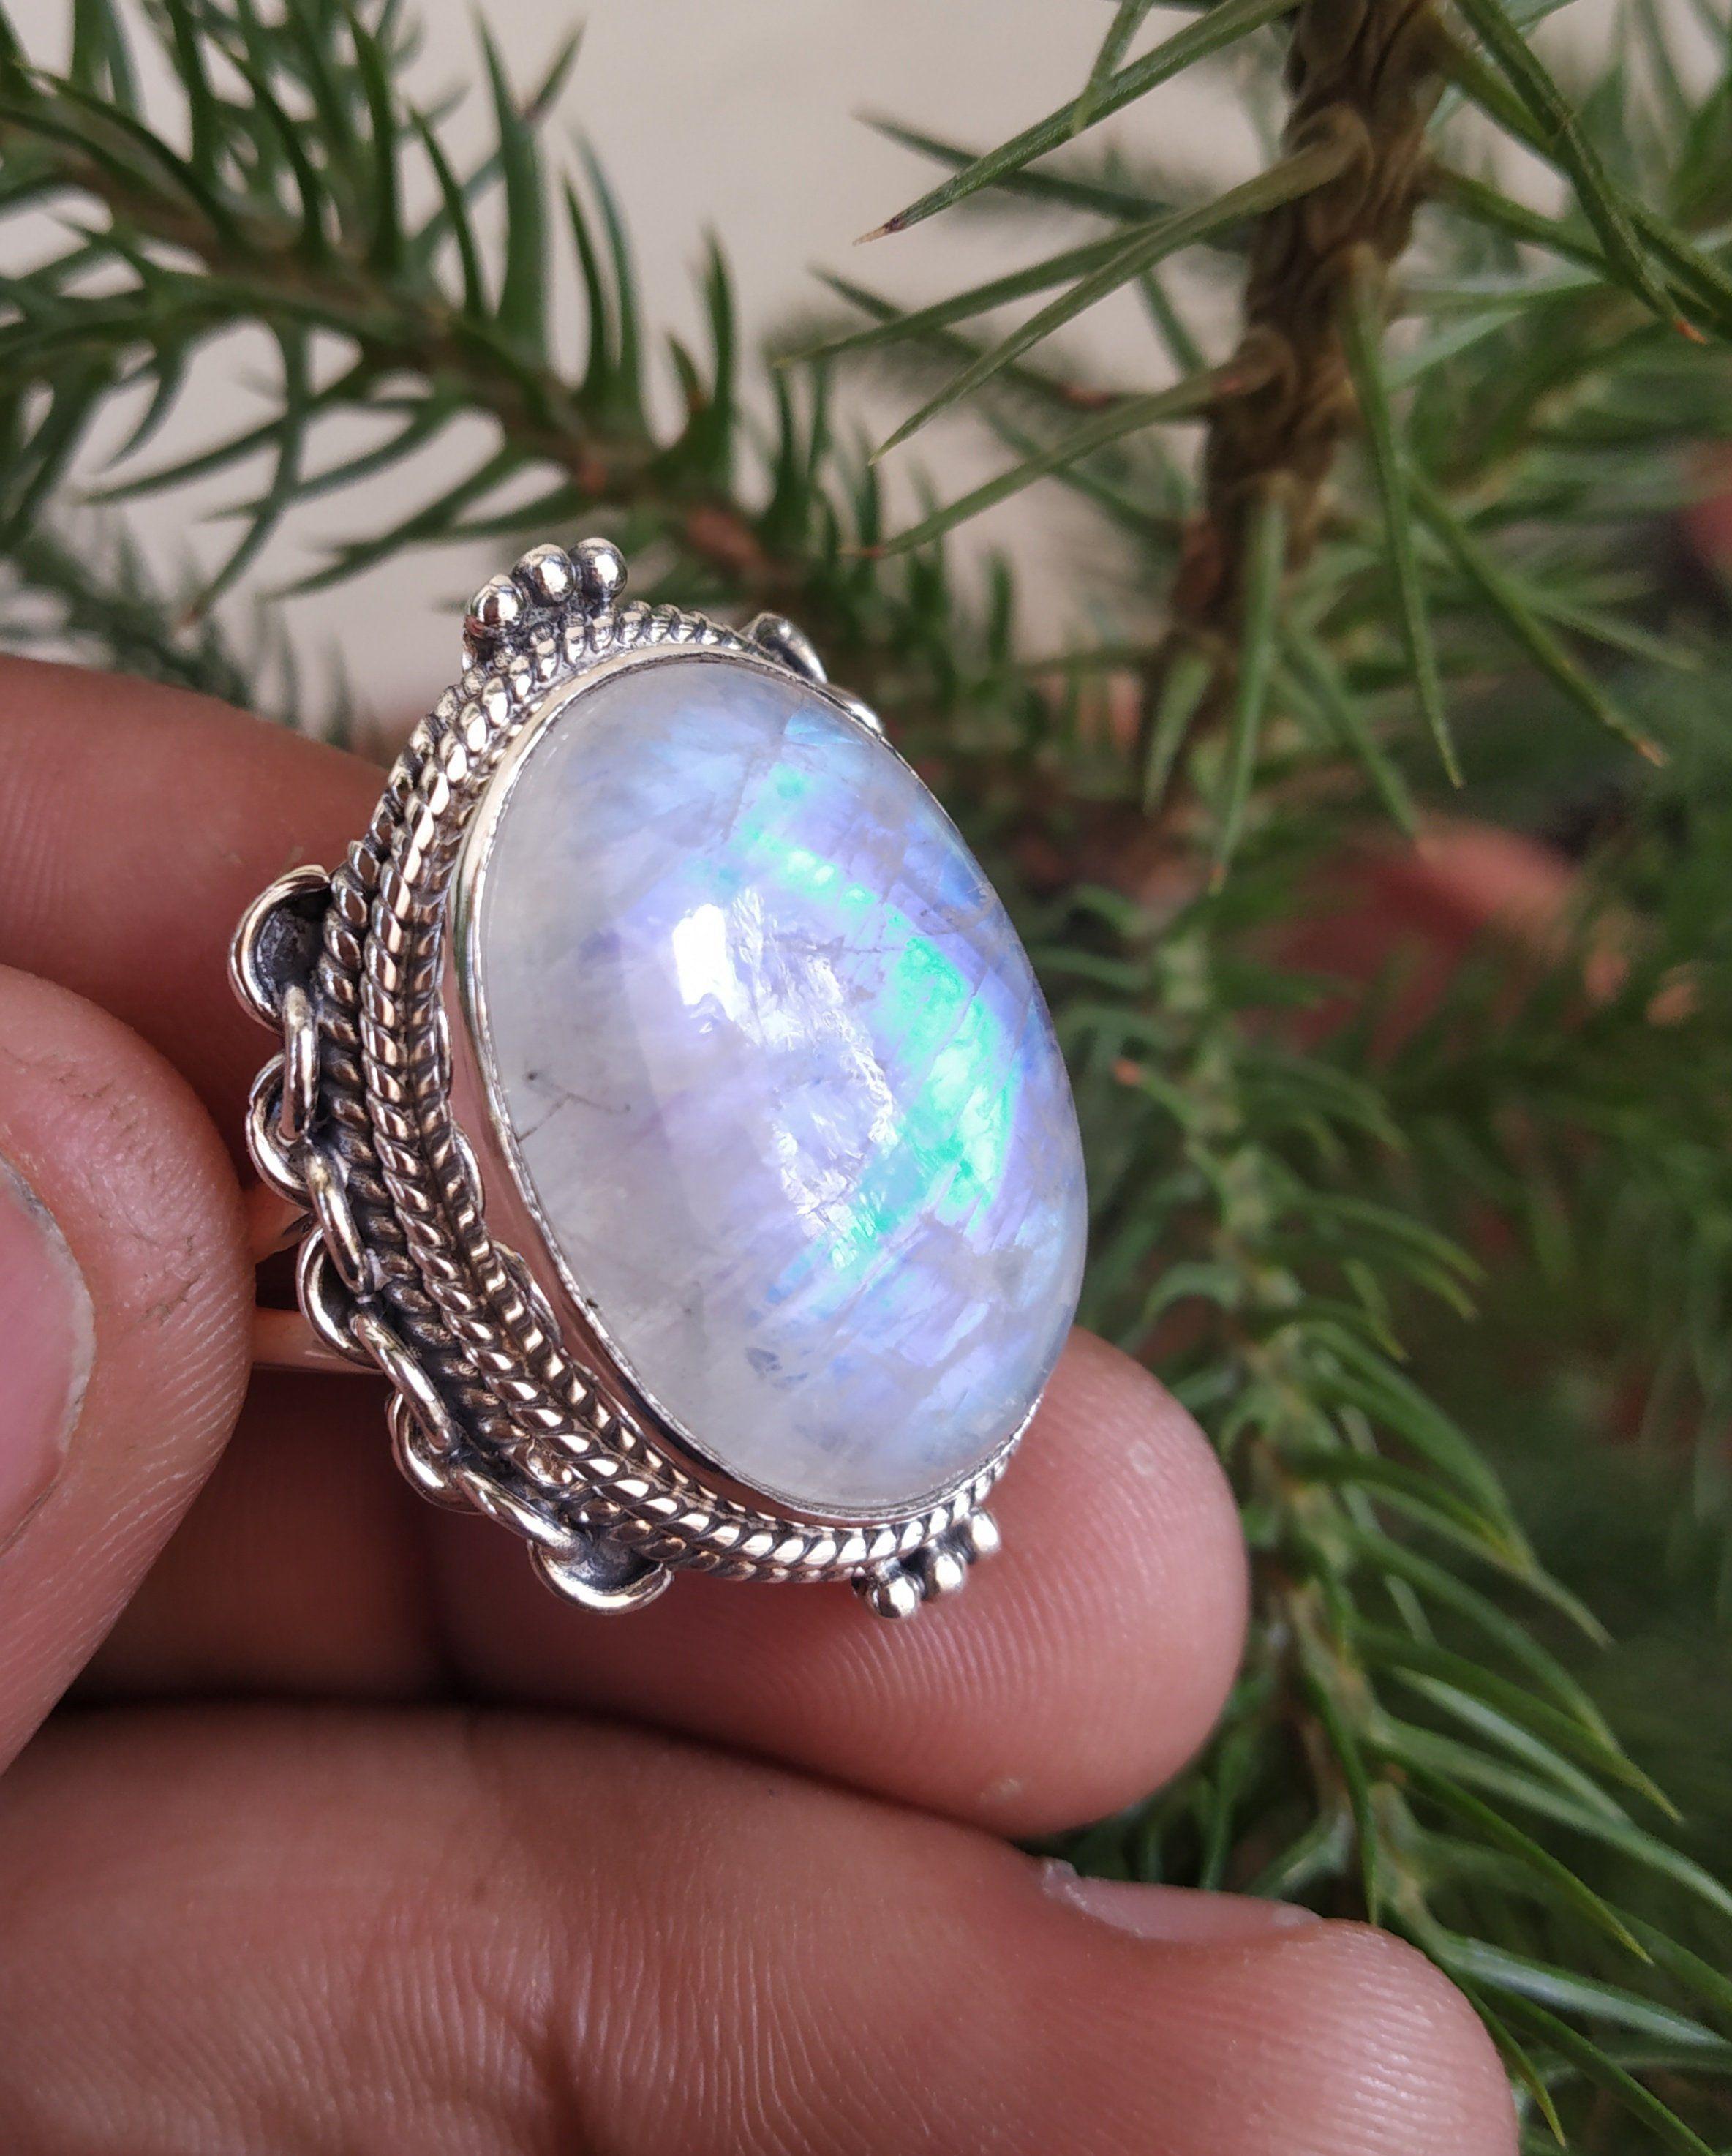 moonstone ring rainbow moonstone ring handmade jewelry 925 sterling silver blue flash moonstone ring gemstone ring women/'s anniversary ring